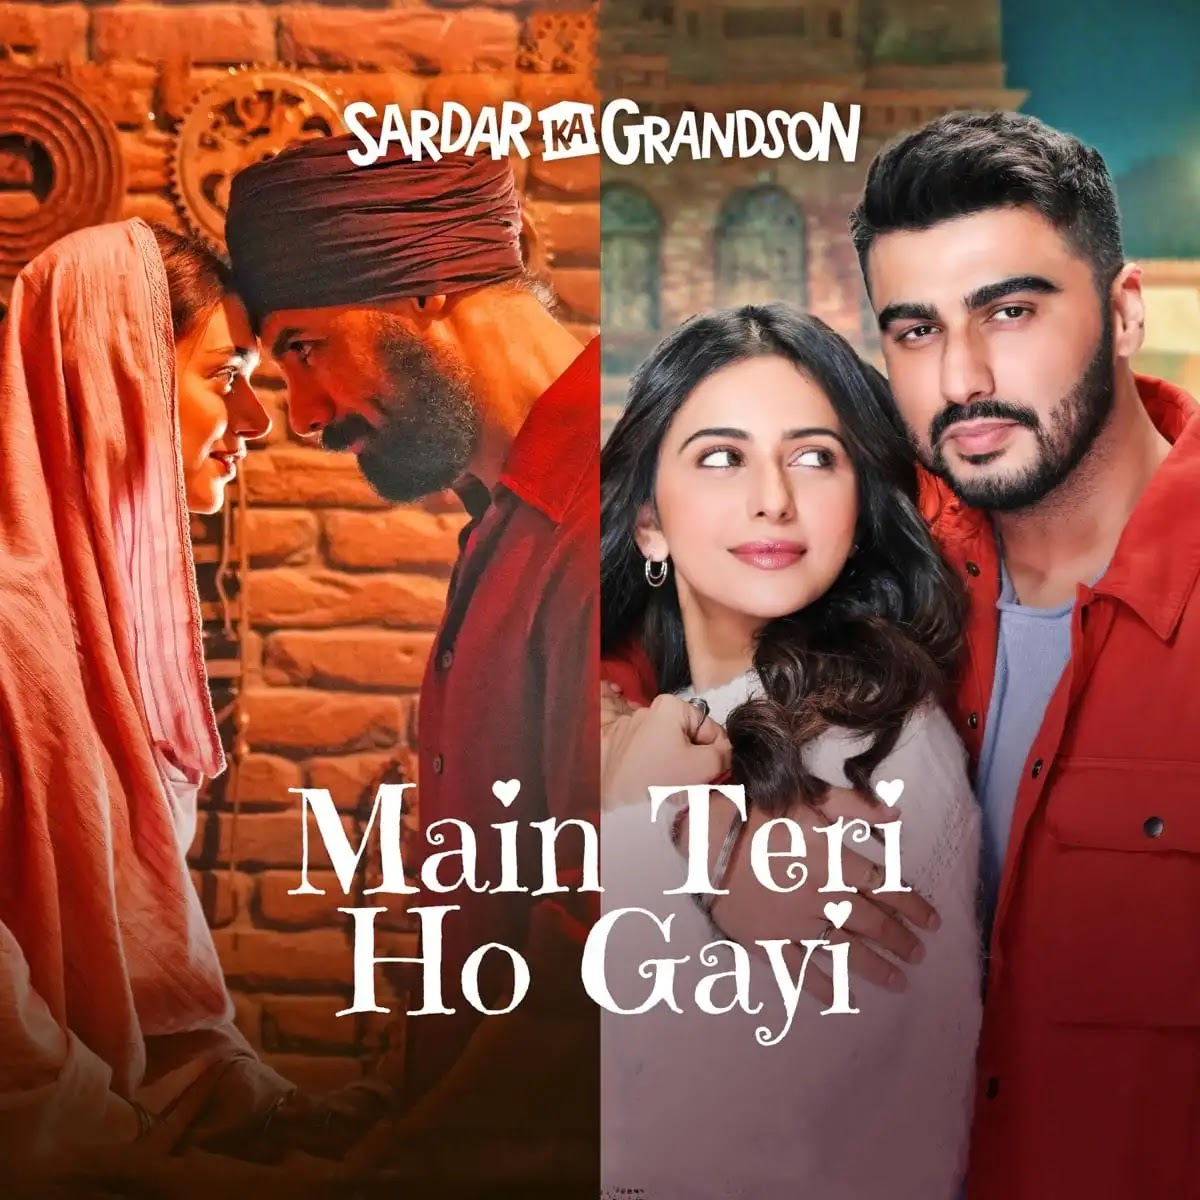 Main Teri Ho Gayi Sardar Ka Grandson MP3 Song Download